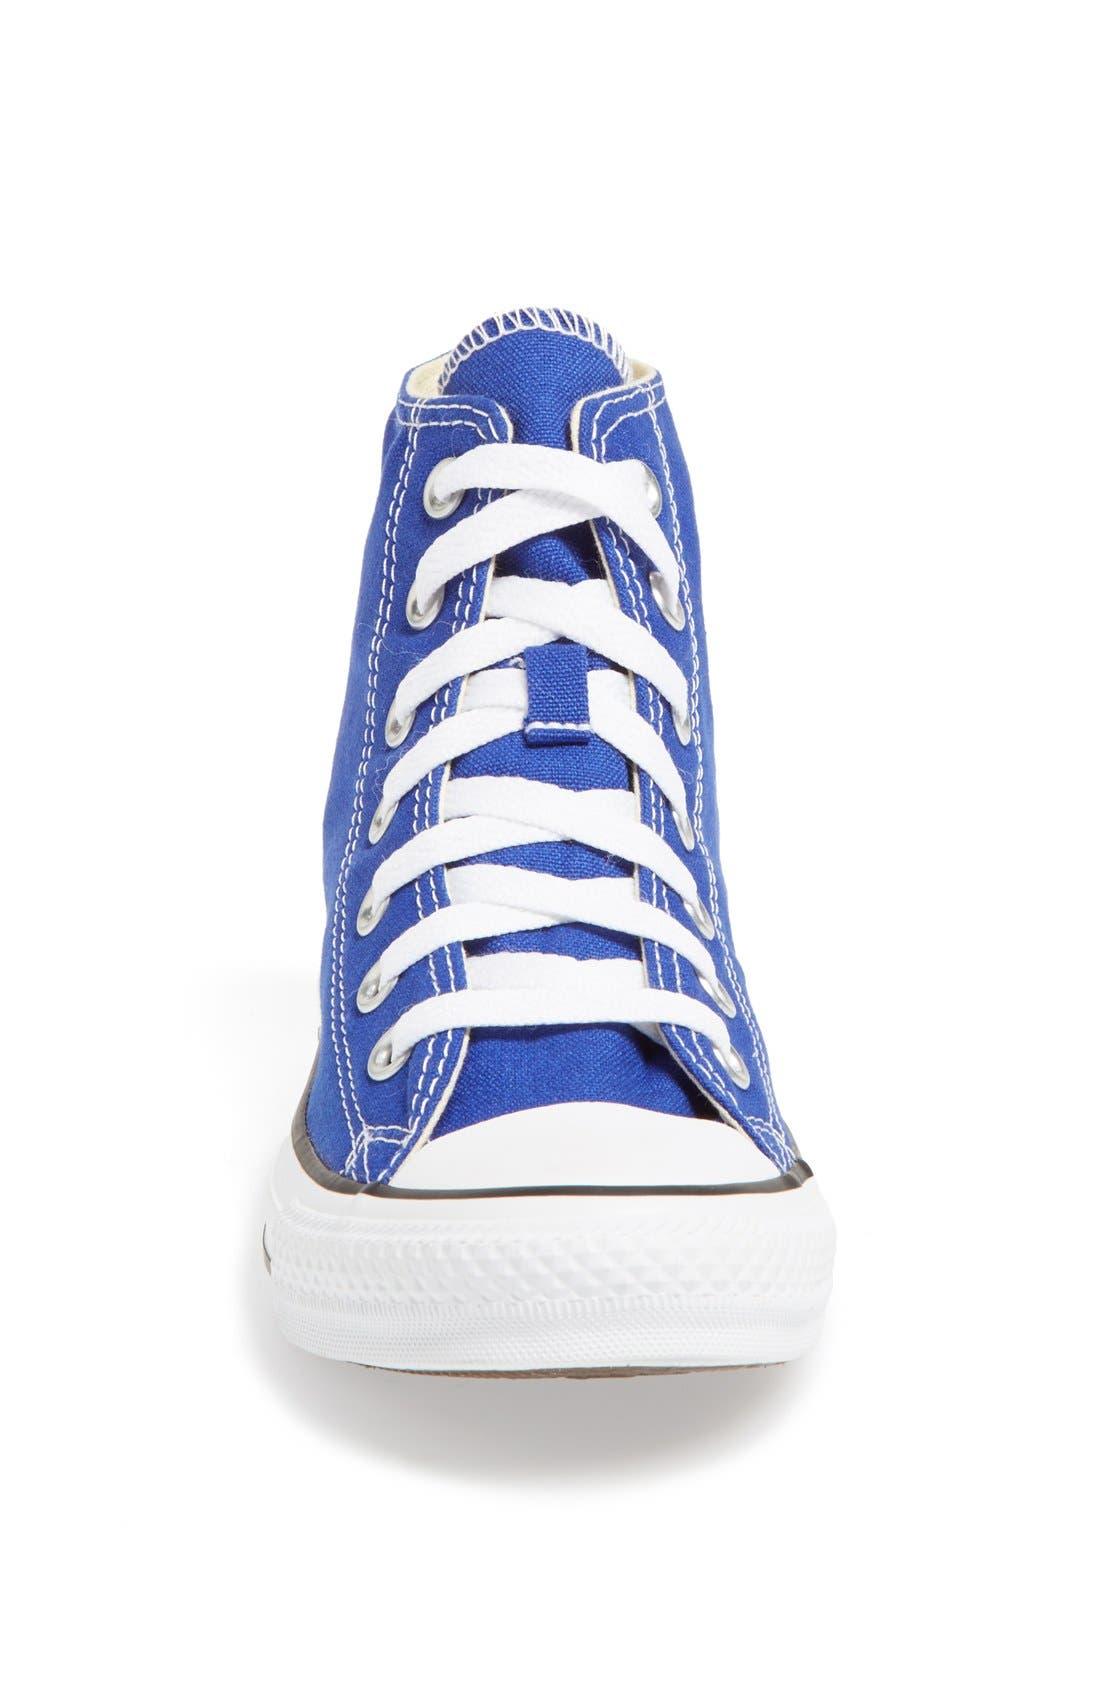 Alternate Image 3  - Converse Chuck Taylor® All Star® High Top Sneaker (Women)